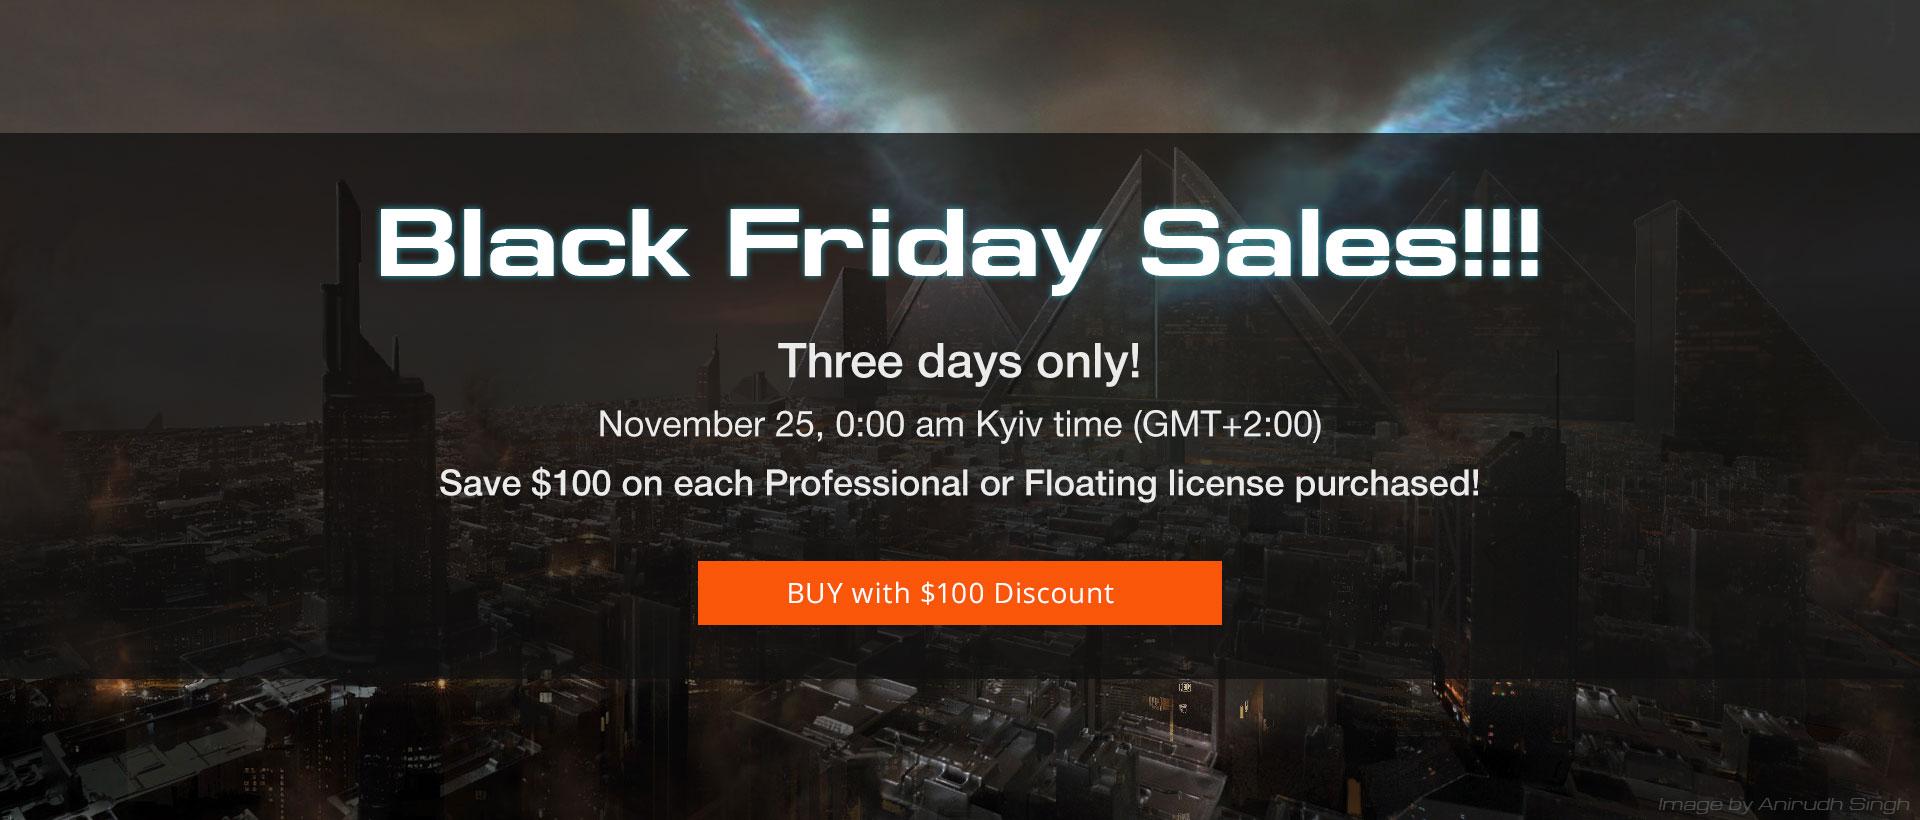 3dcoat black friday sales 3dtotal forums howldb - 3 suisses black friday ...